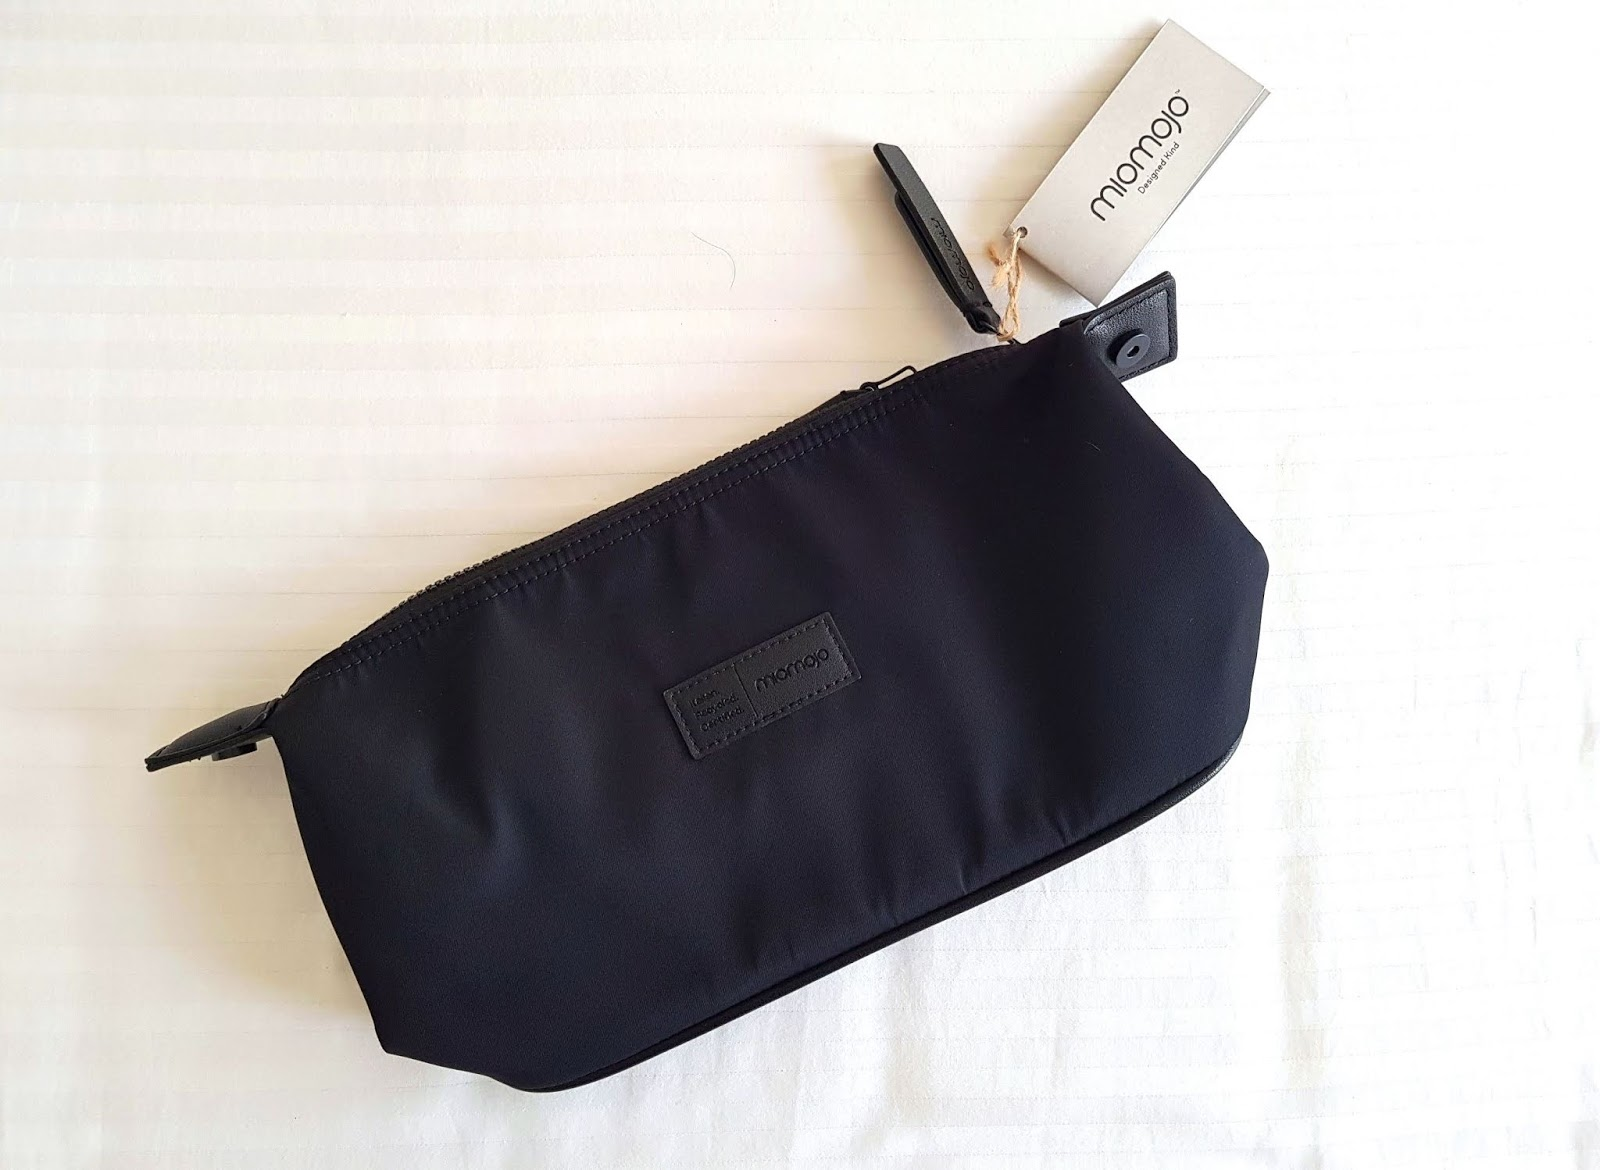 Sustainable ecofriendly bags - Vegan bag Miomojo eco friendly cosmetics case